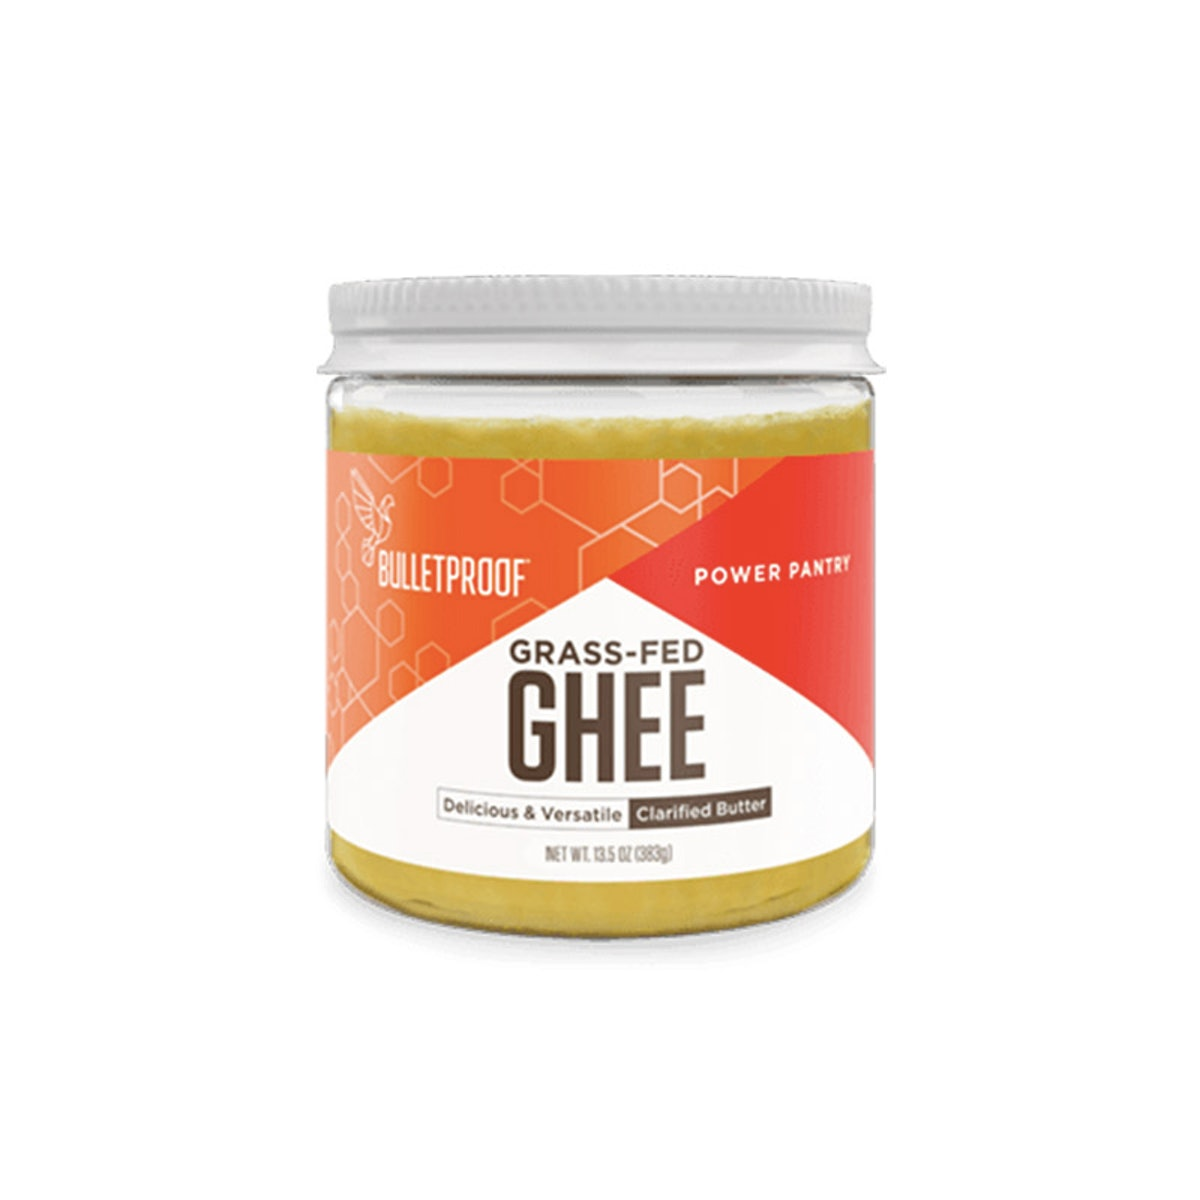 Grass-Fed Ghee